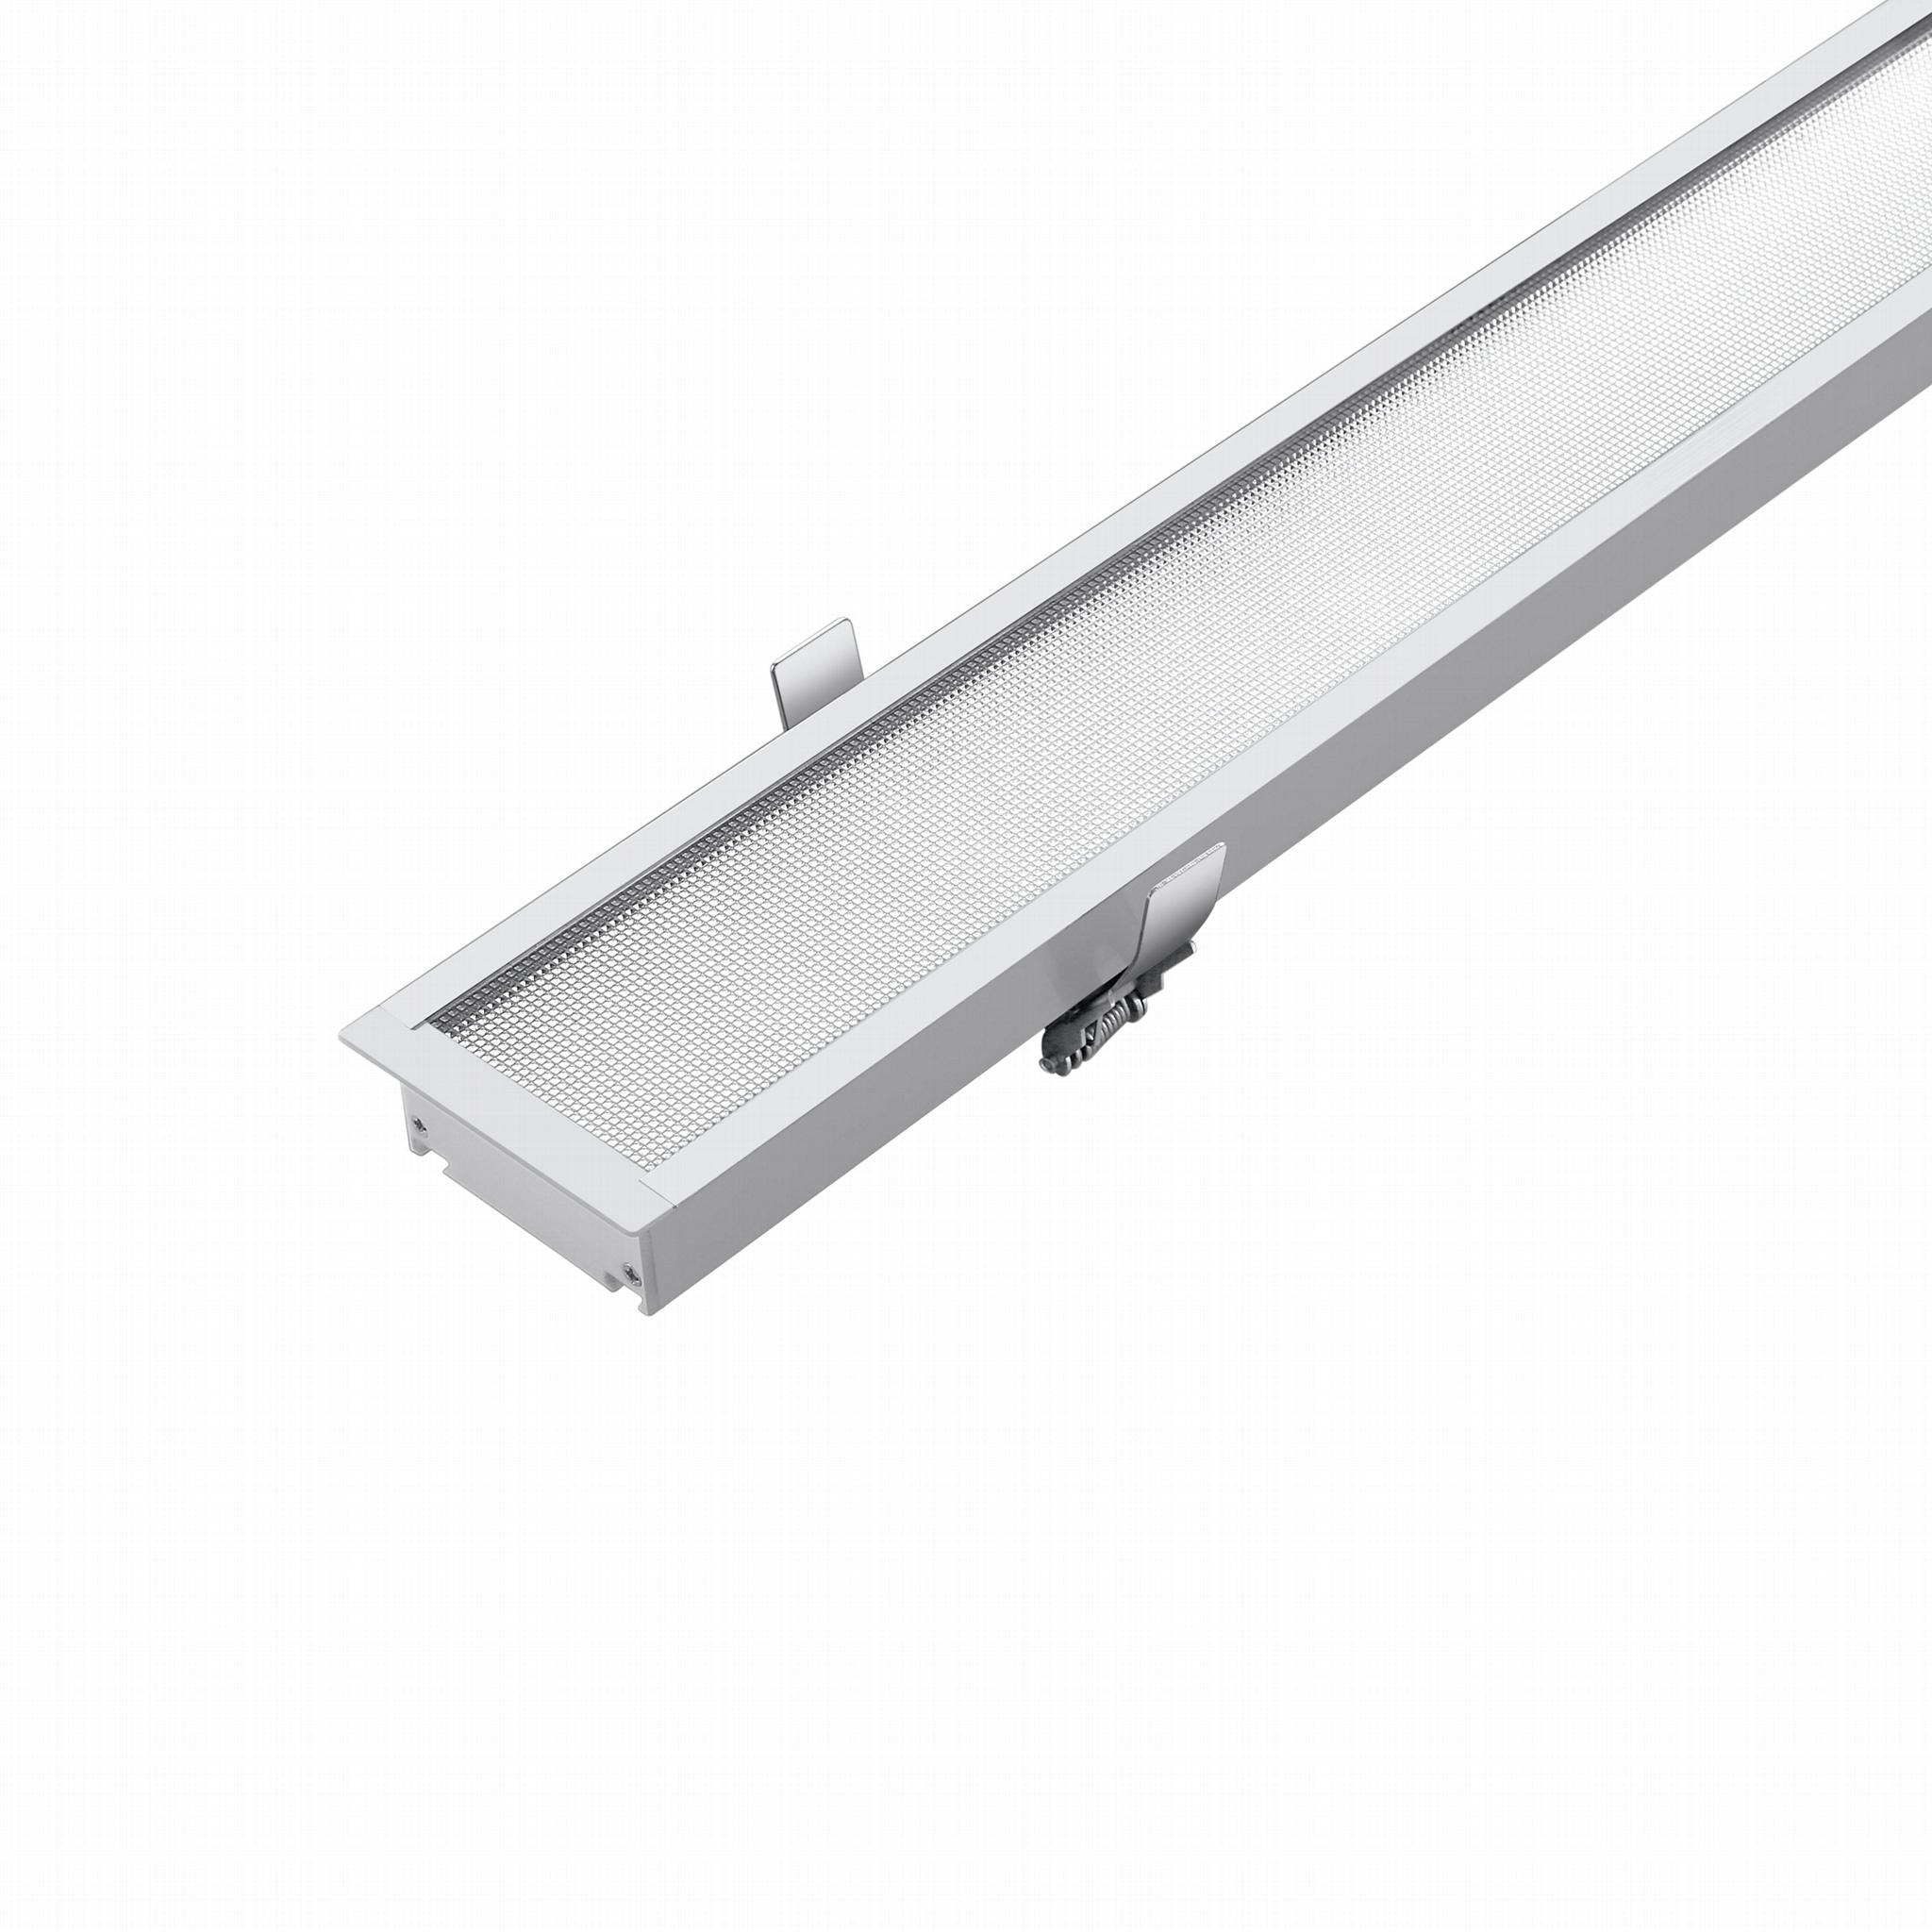 嵌入式LED線性燈 LE8030-PZ 3